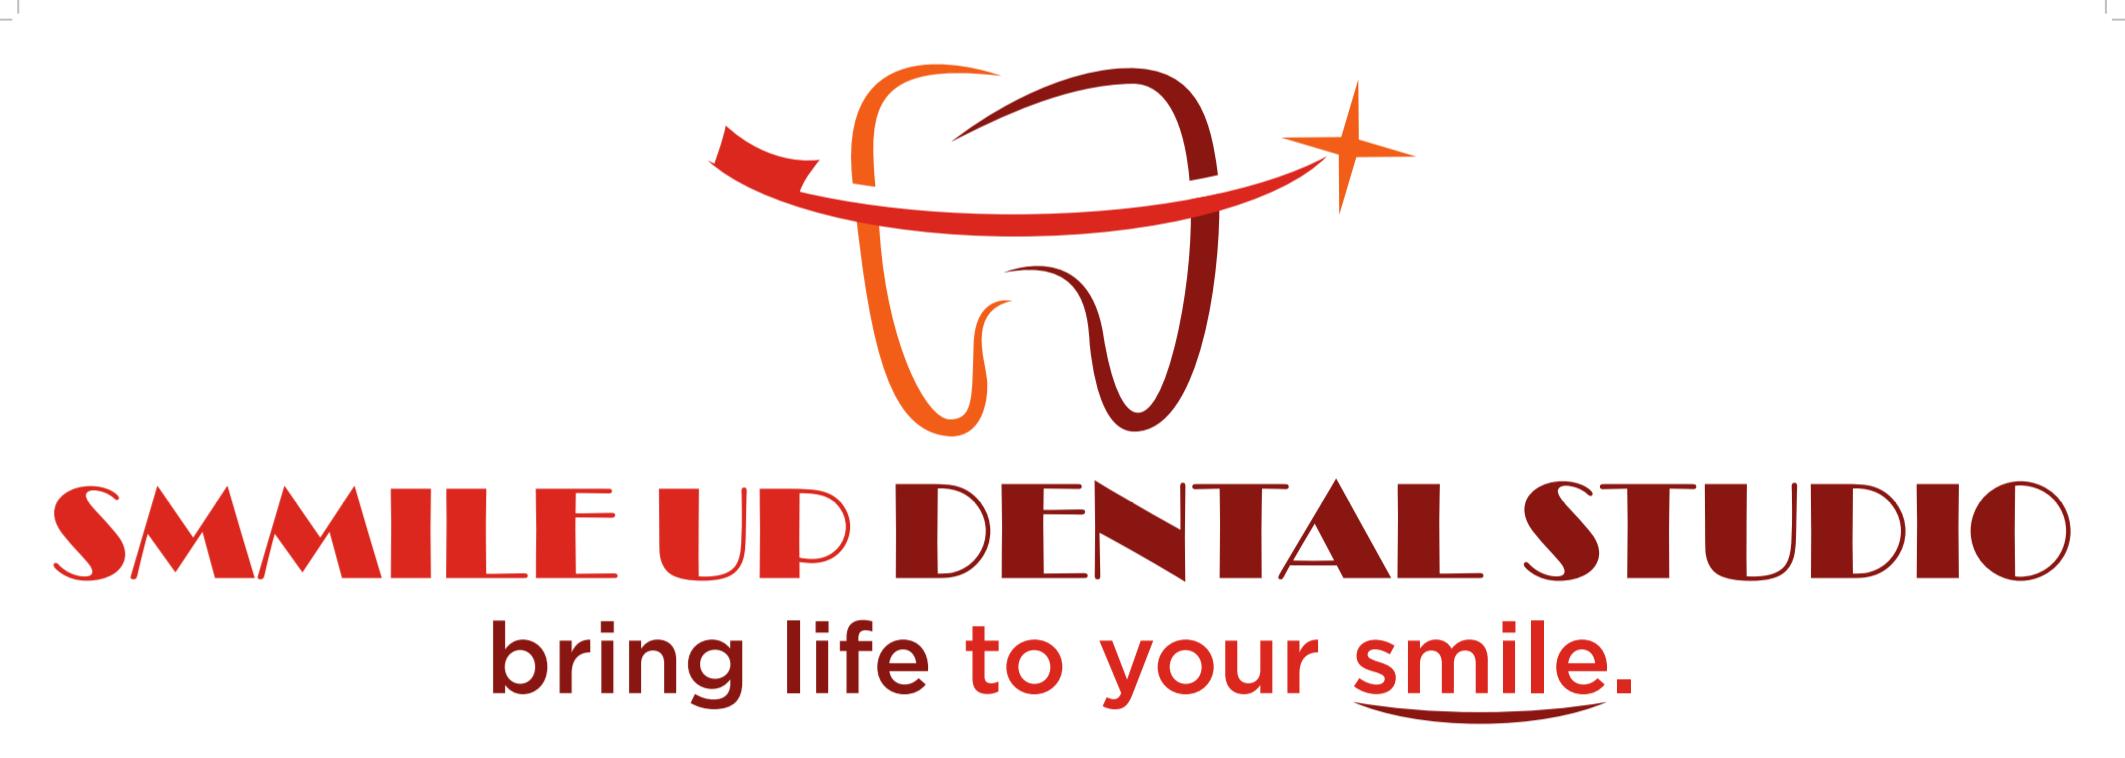 Smmile Up Dental Studio